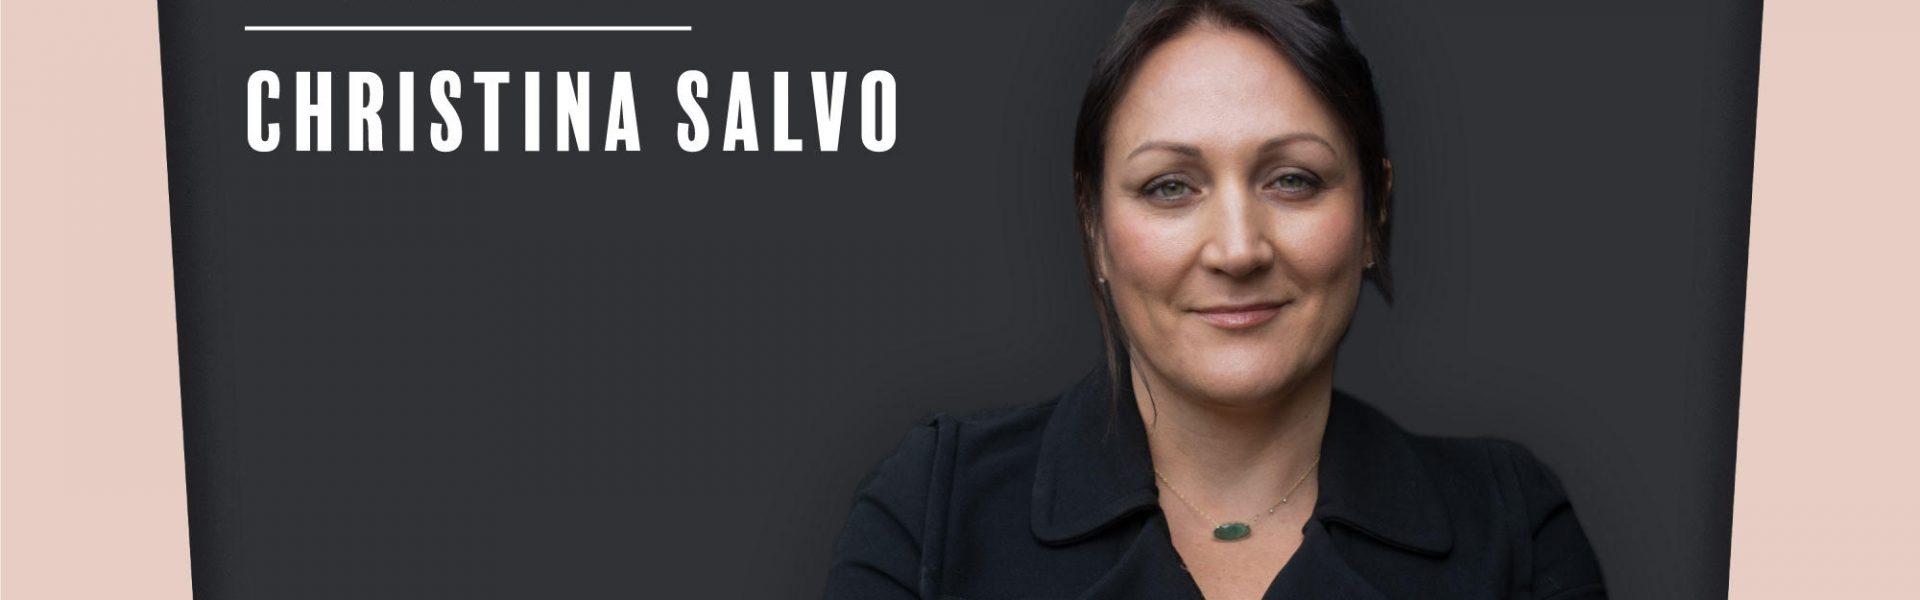 The Ex Files podcast with Christina Salvo